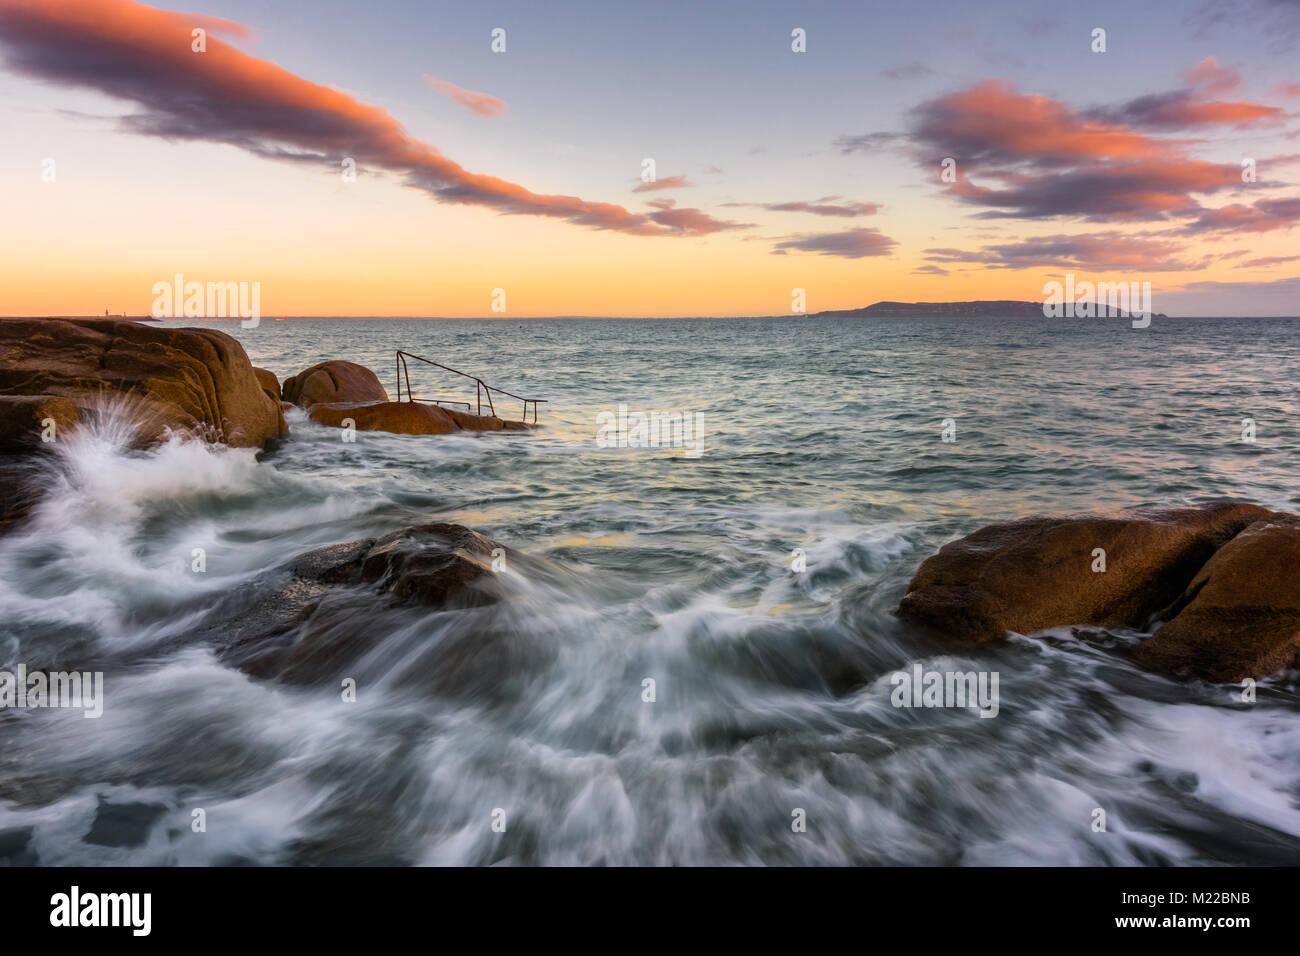 Sunrise at 40 Foot in Ireland - Stock Image